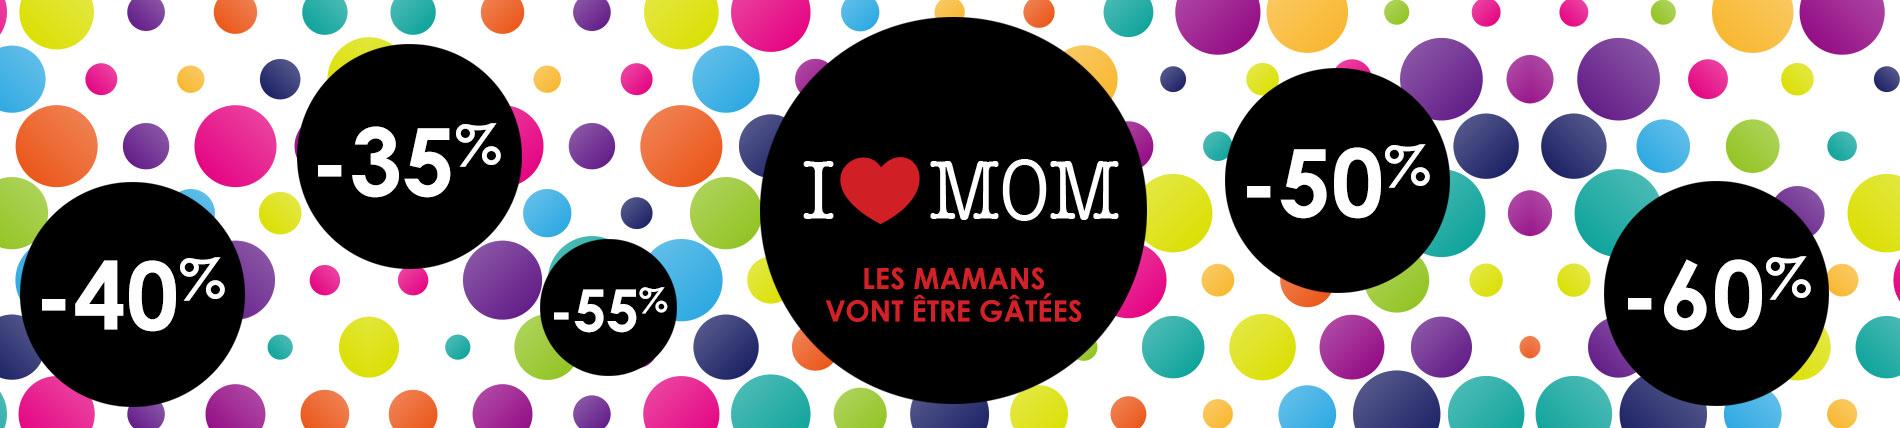 I LOVE MOM - SPÉCIAL FÊTE DES MÈRES